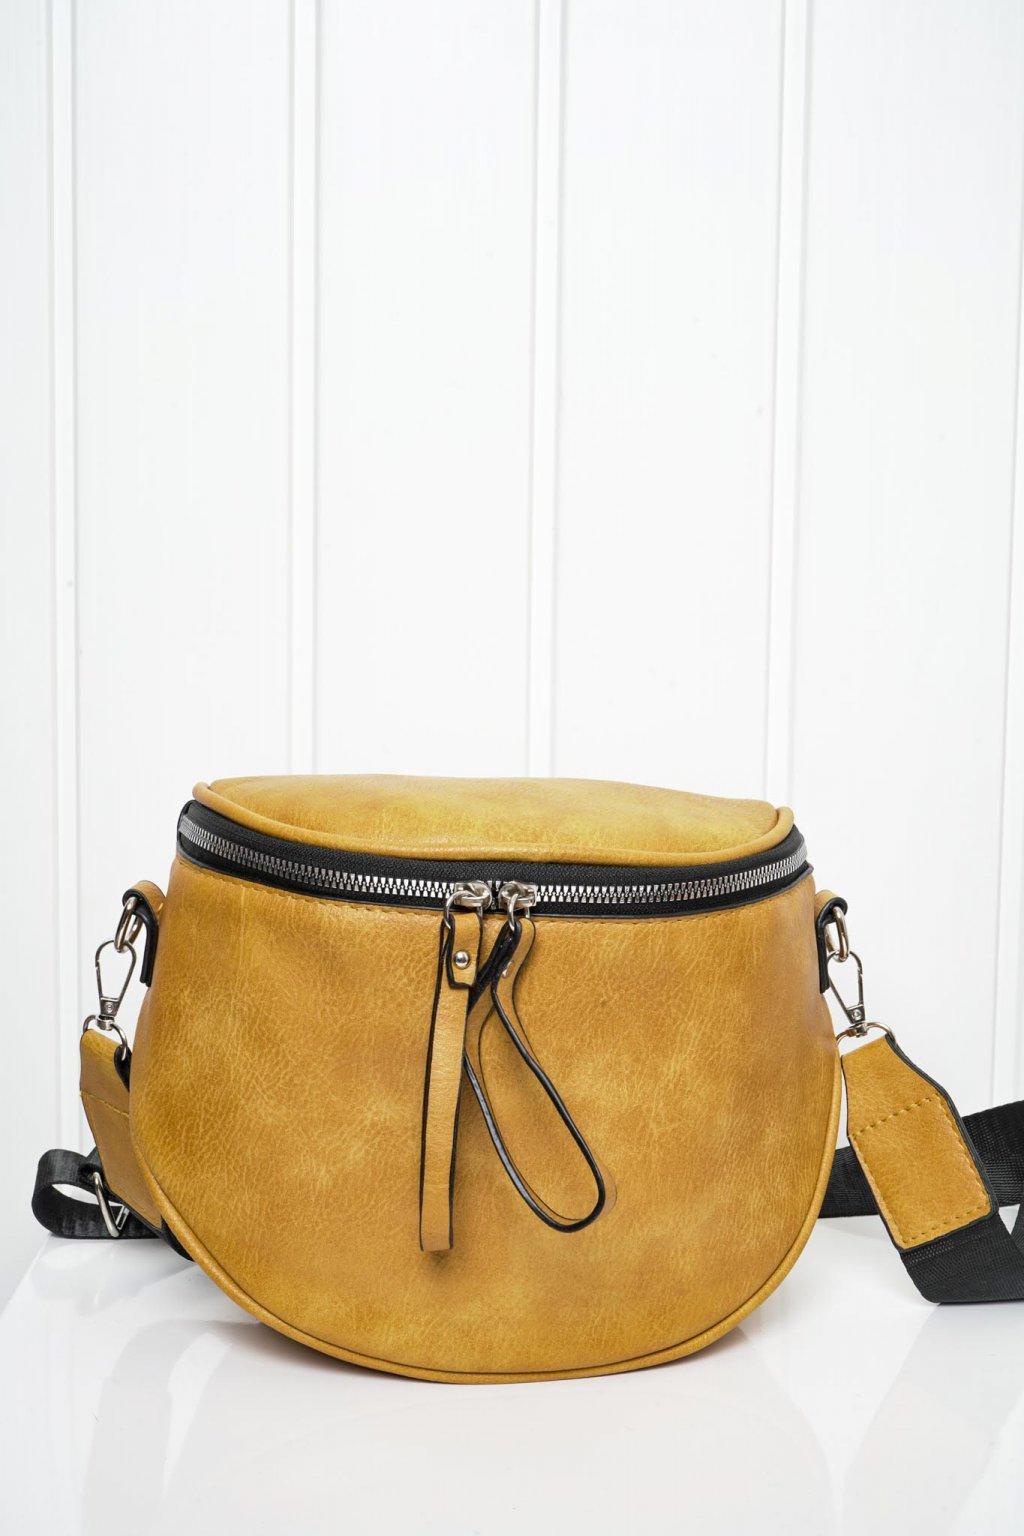 Kabelka, crossbody, ruksak, shopping bag, shopperka, 172